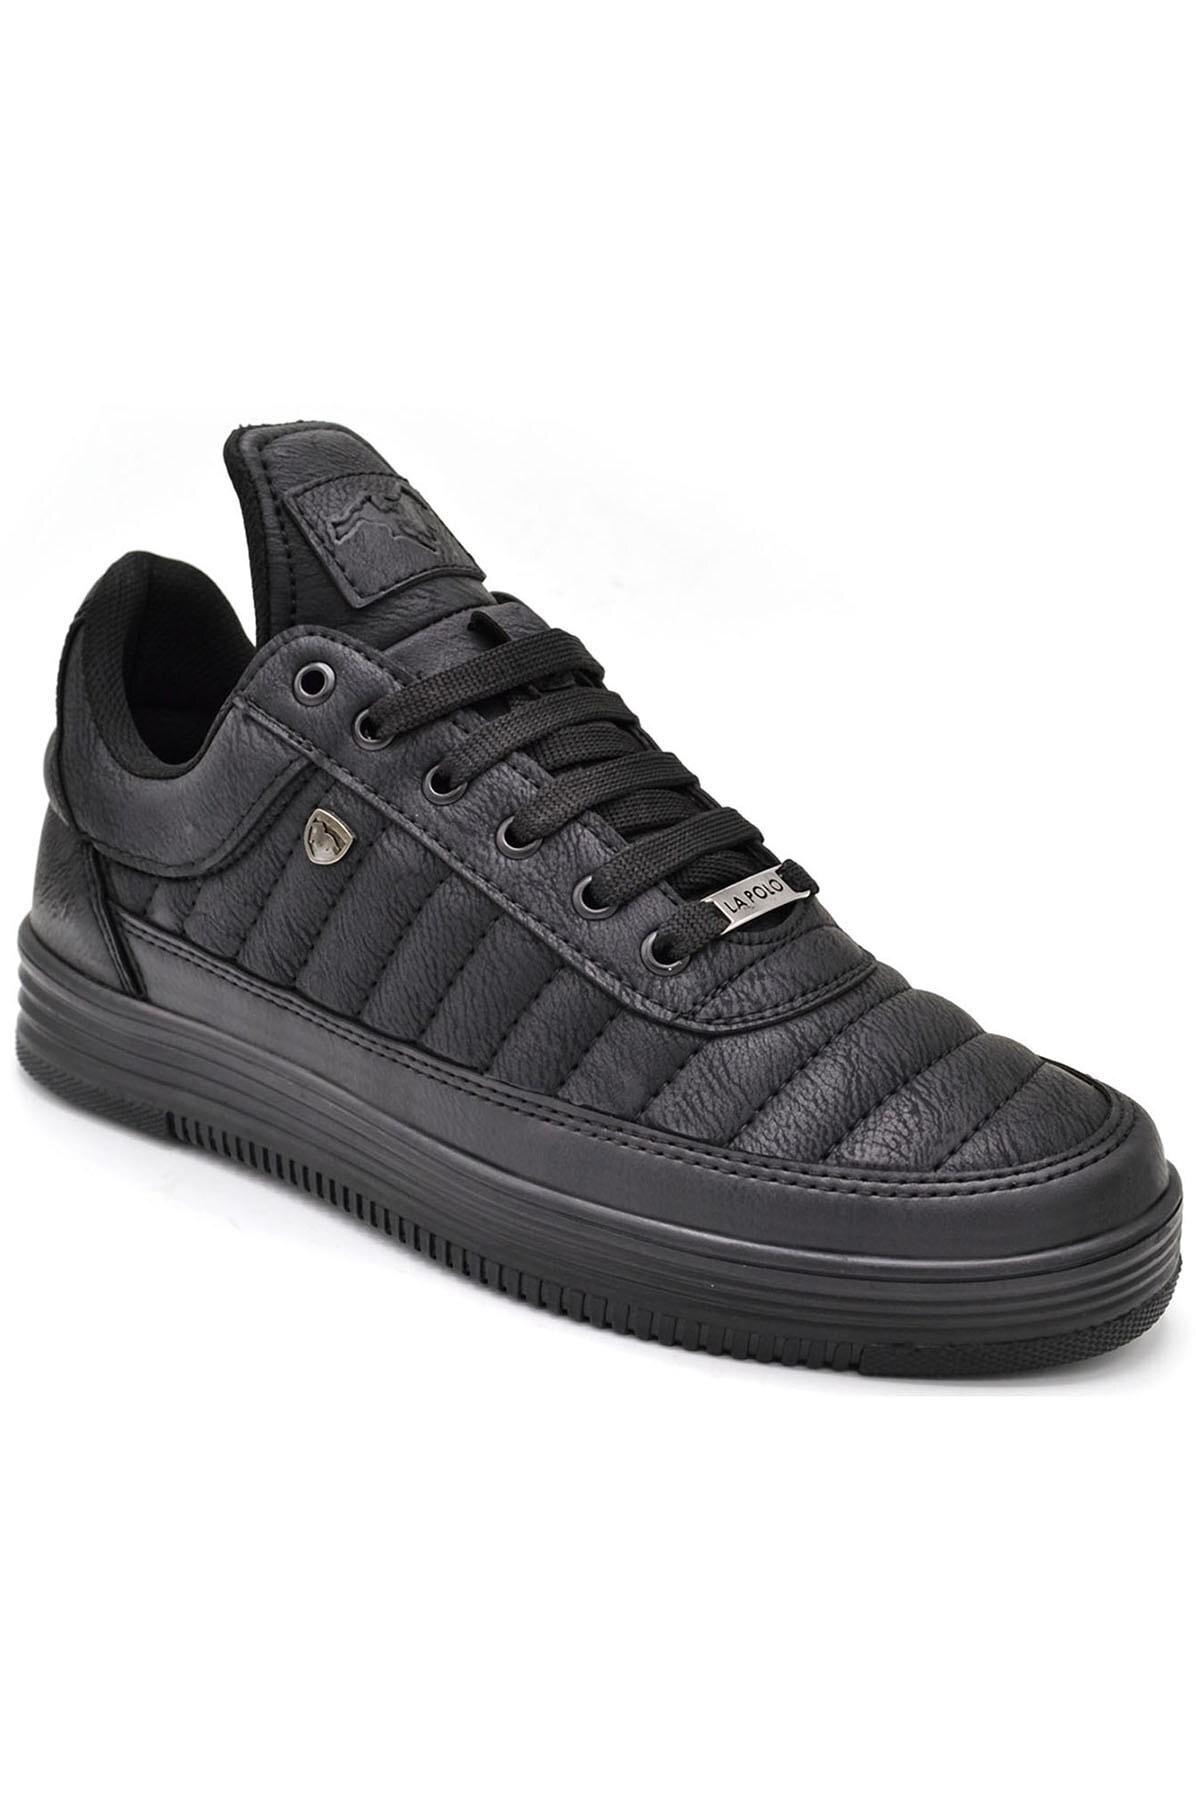 L.A Polo 07 Siyah Siyah Dikişli Taban Unisex Spor Ayakkabı 1